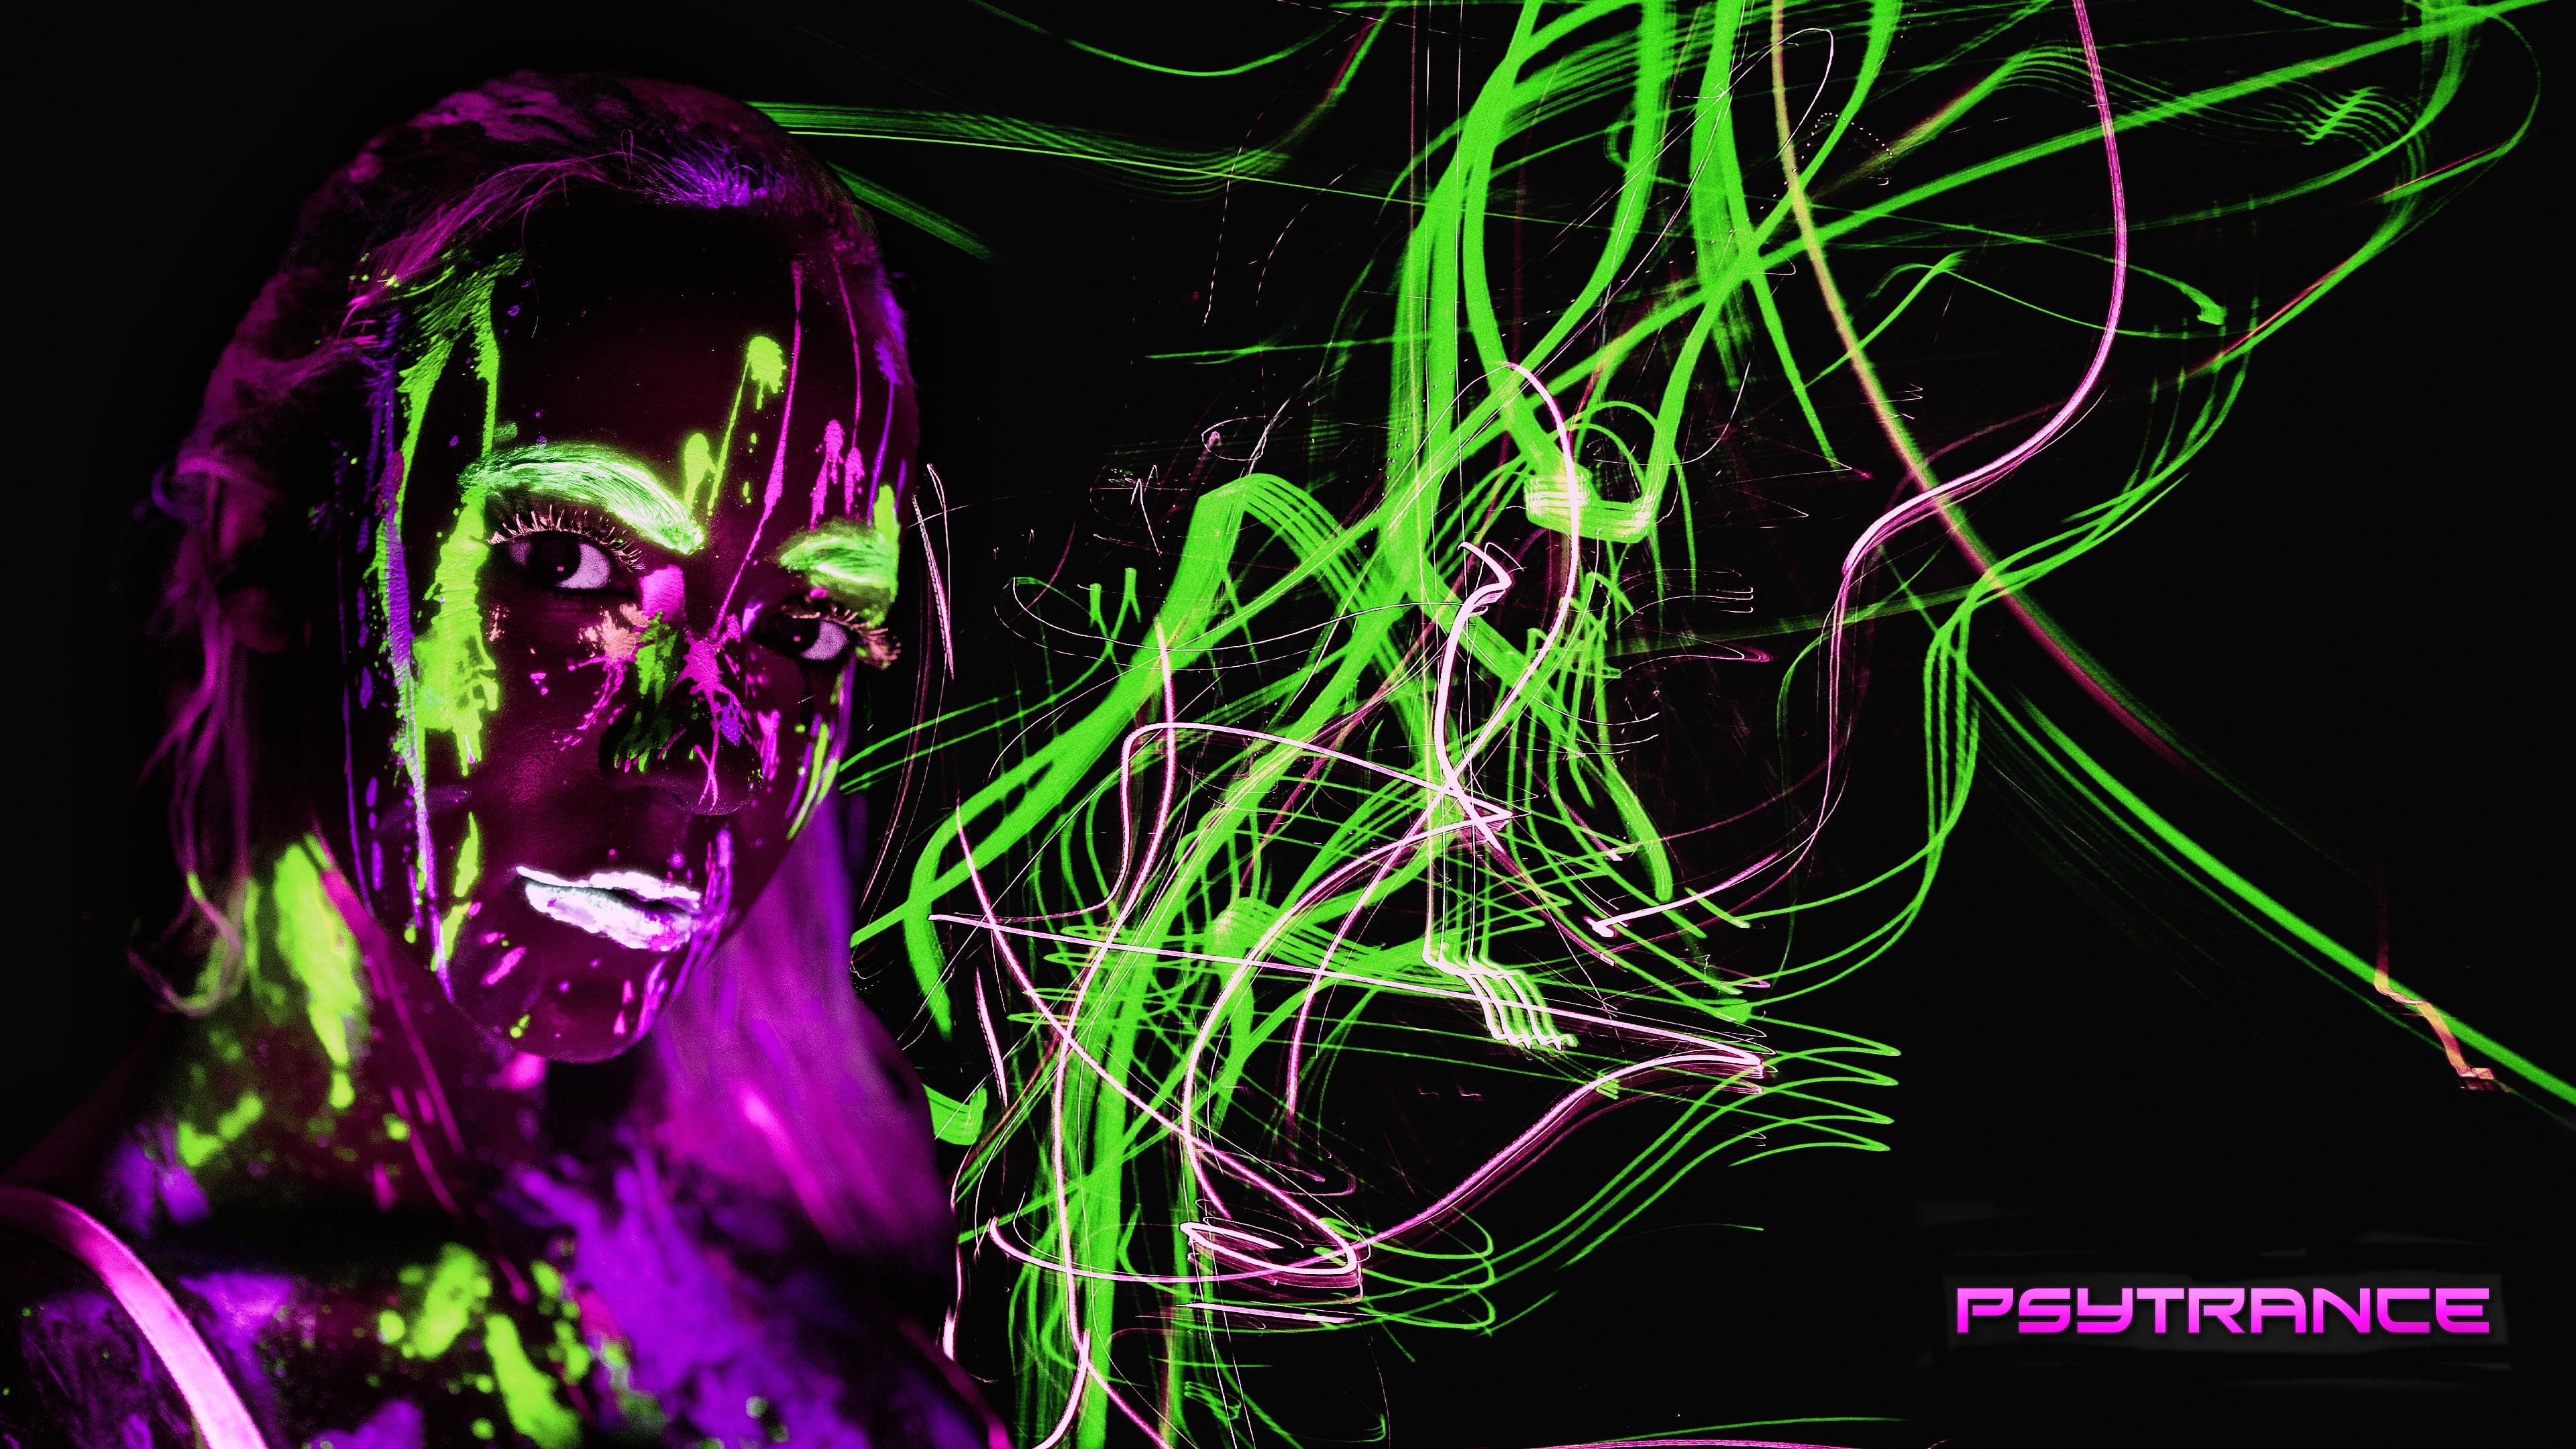 Music Trance Psychedelic Fantasy Art Artwork Fan Art Concept Art Dark Digital Art Dark Background 3840x2160